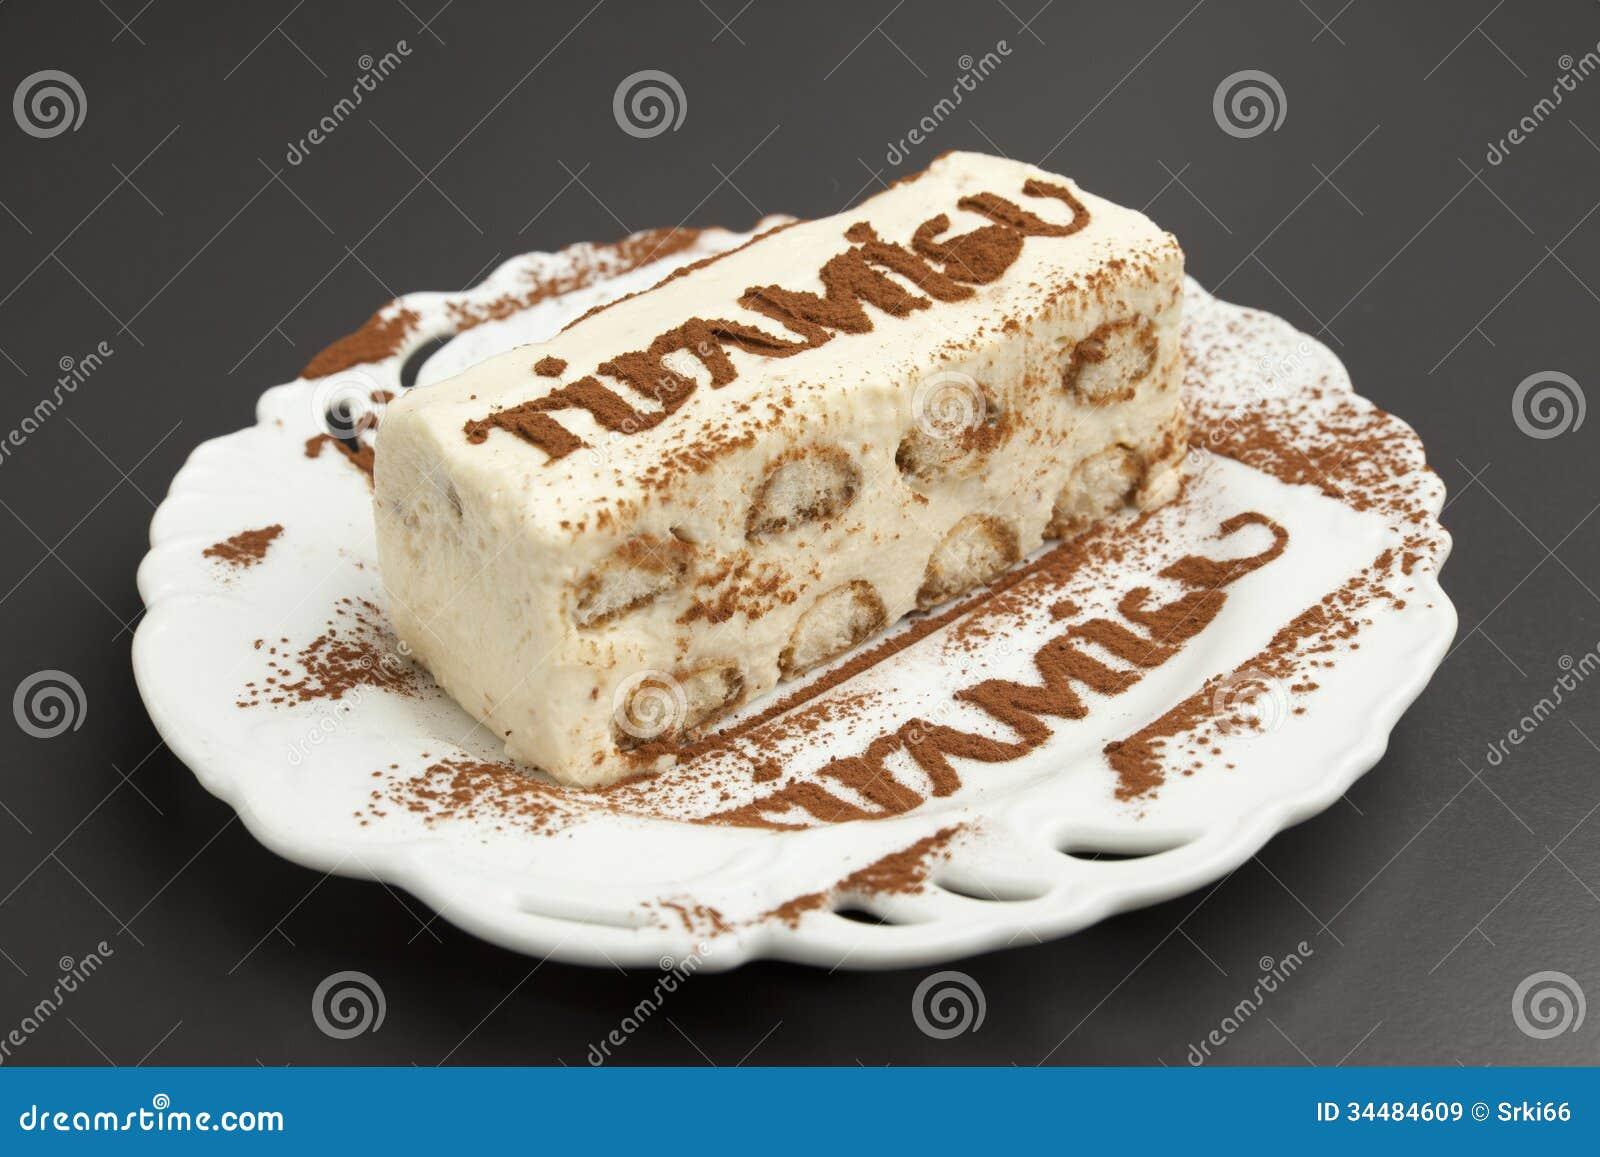 Strawberry Tiramisu Cake